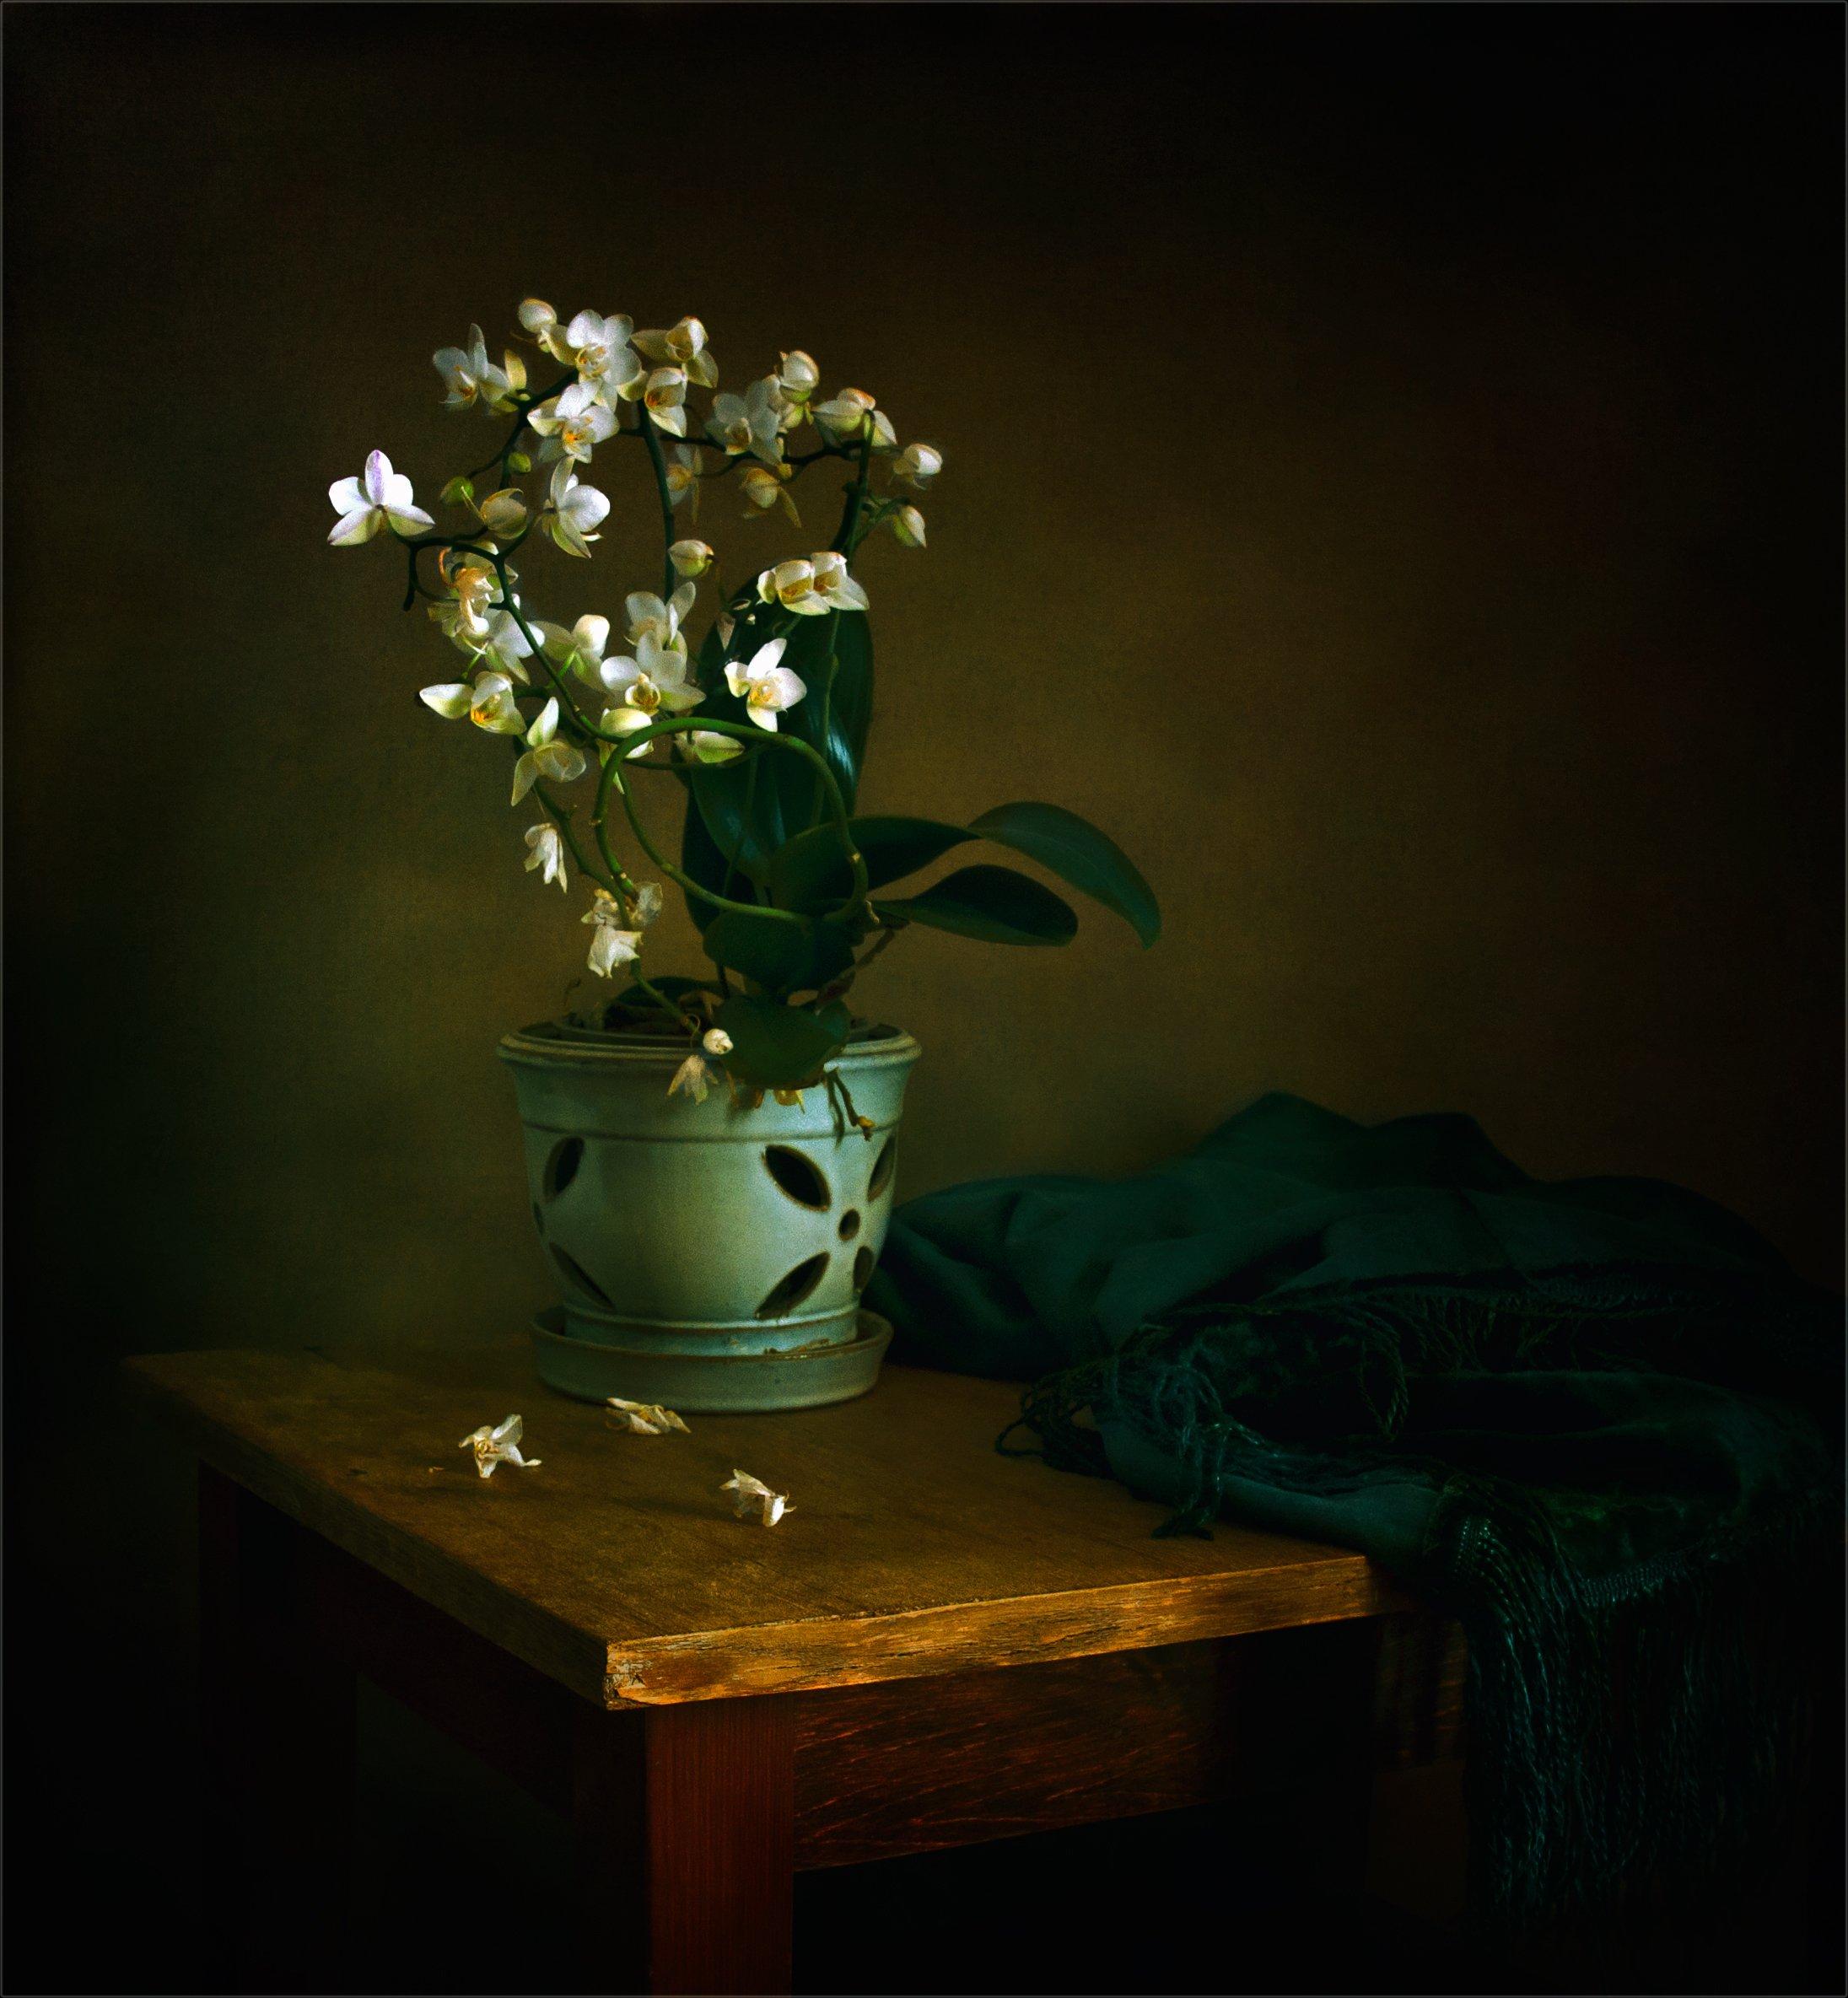 still life, натюрморт,   винтаж, ретро, орхидея, цветы, природа, Михаил MSH